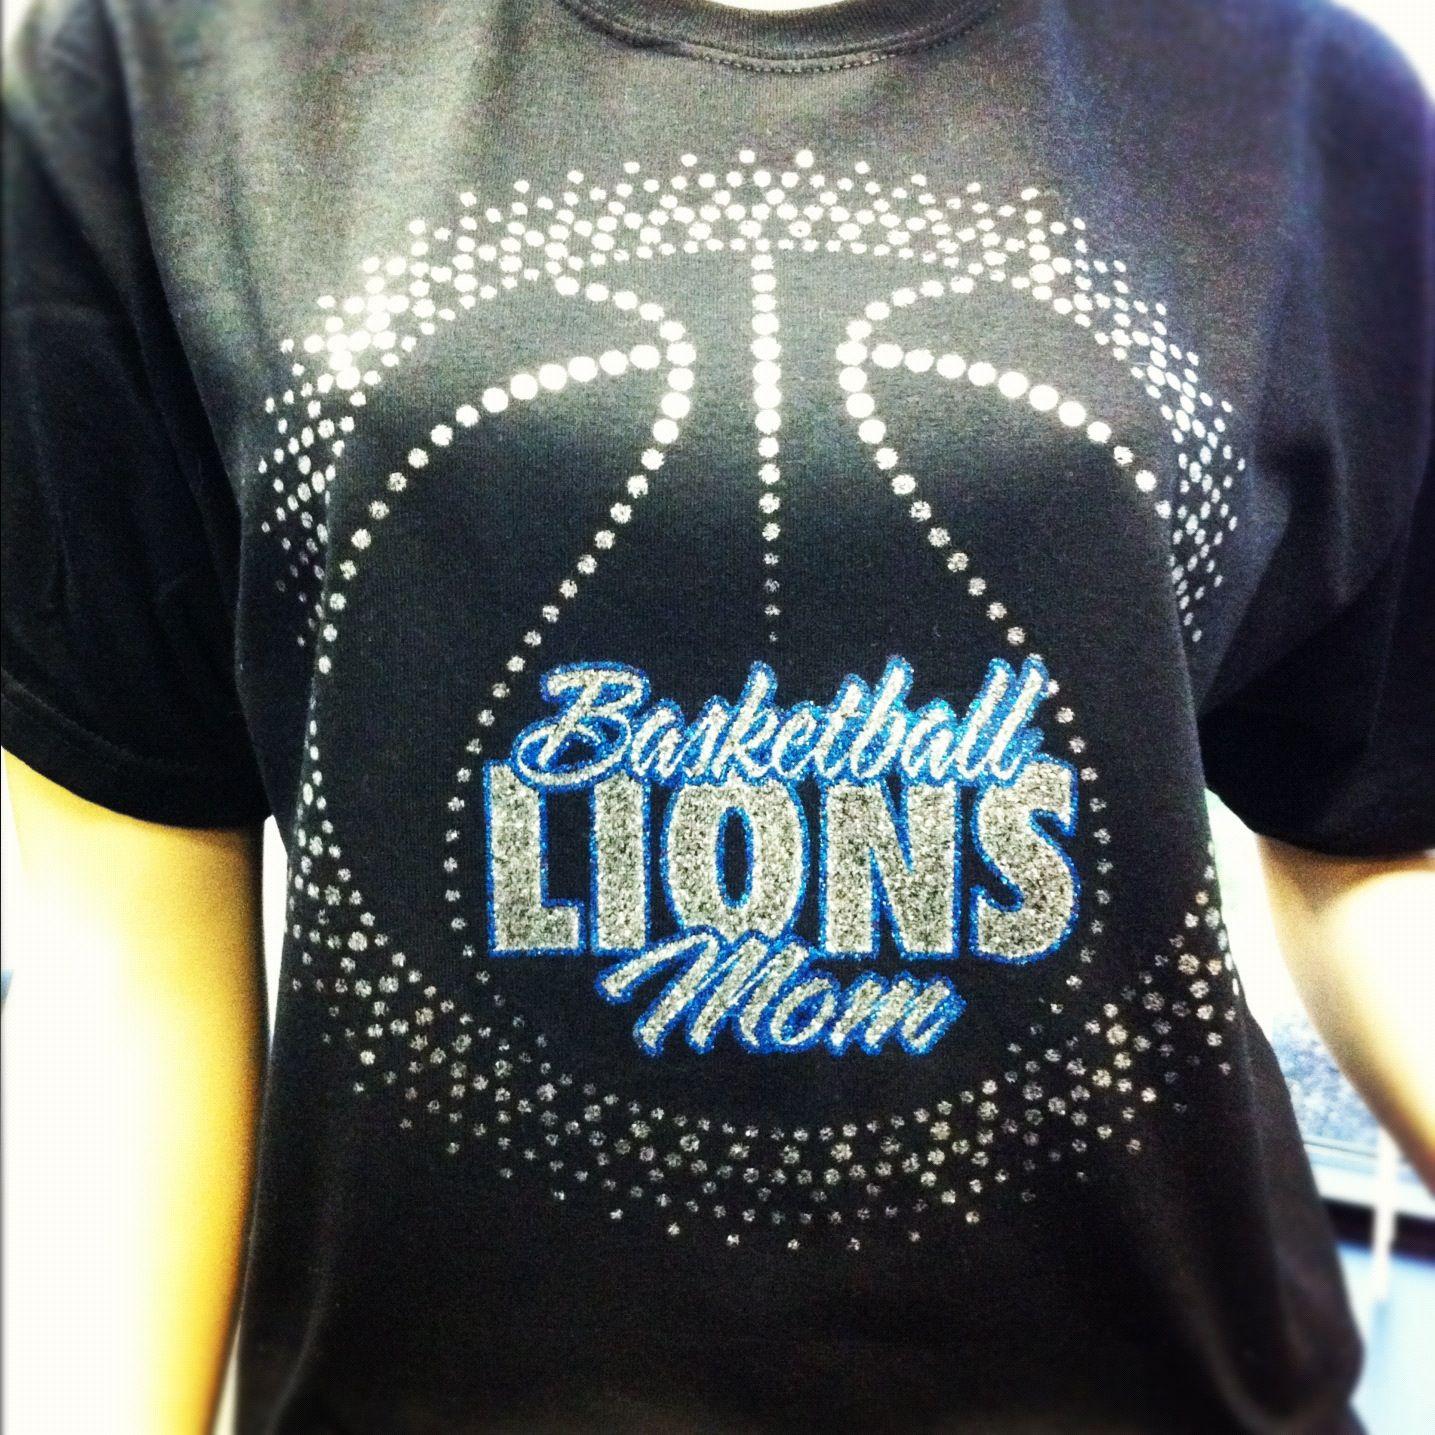 BasketballMom t-shirt design with glitter faux rhinestones: QBK-155 ...